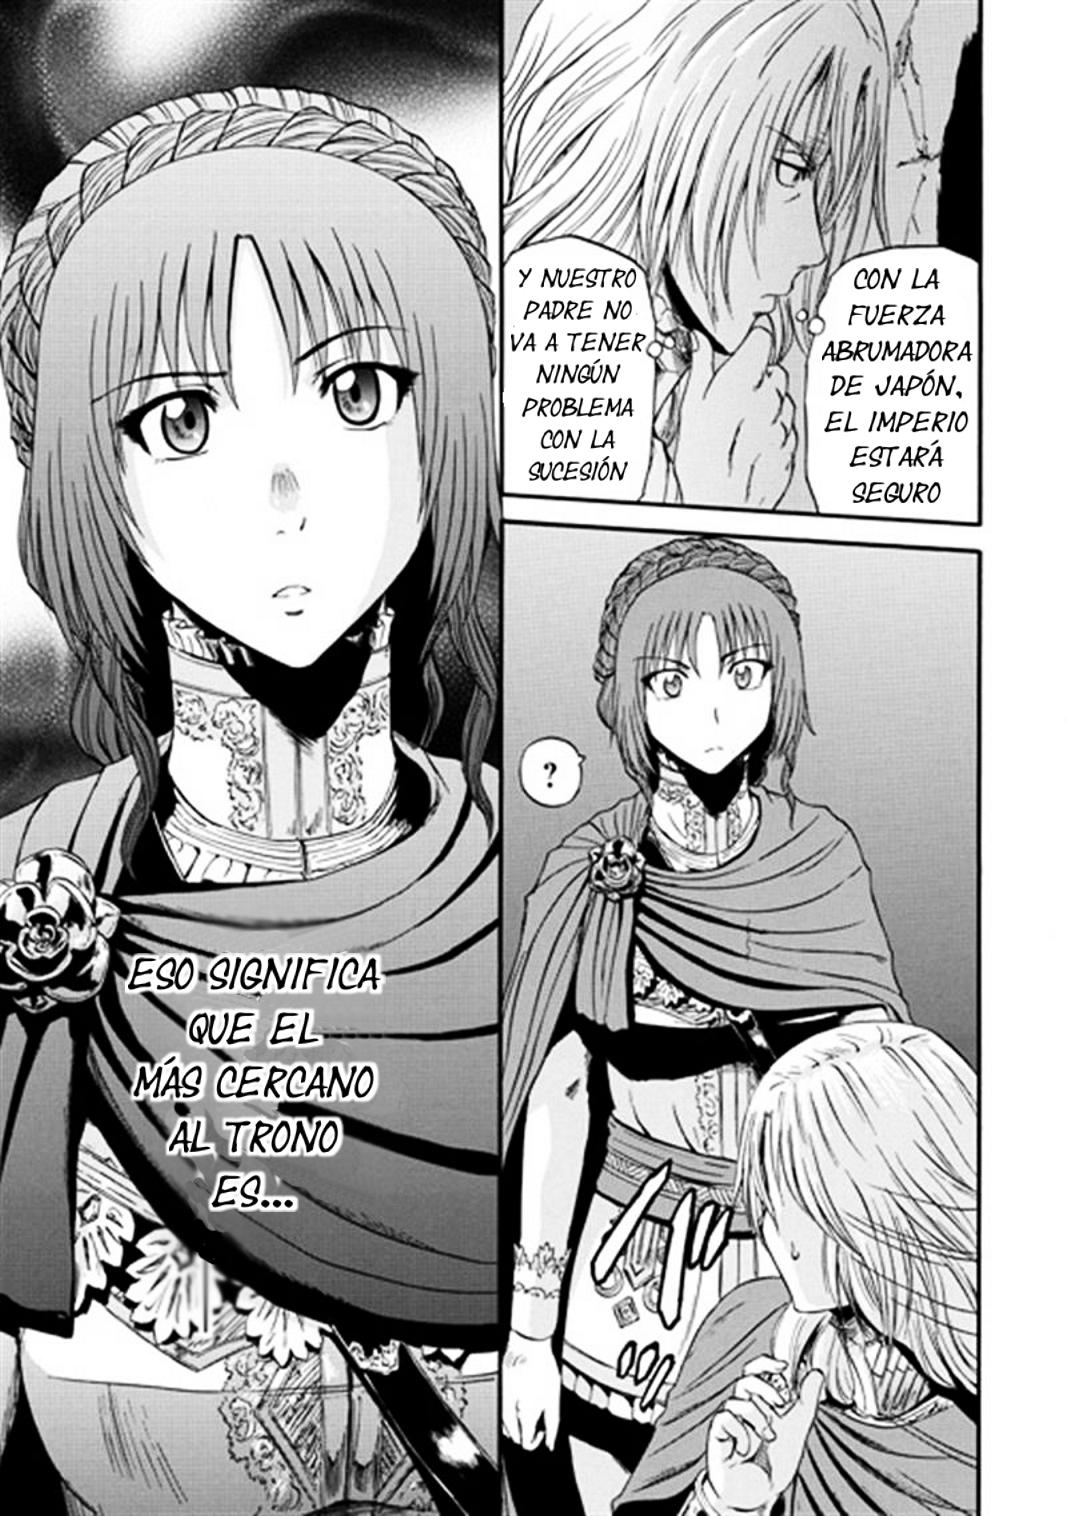 https://c5.ninemanga.com/es_manga/59/187/351176/da960bb5bdcdc36aa9f836df530a9e3c.jpg Page 30